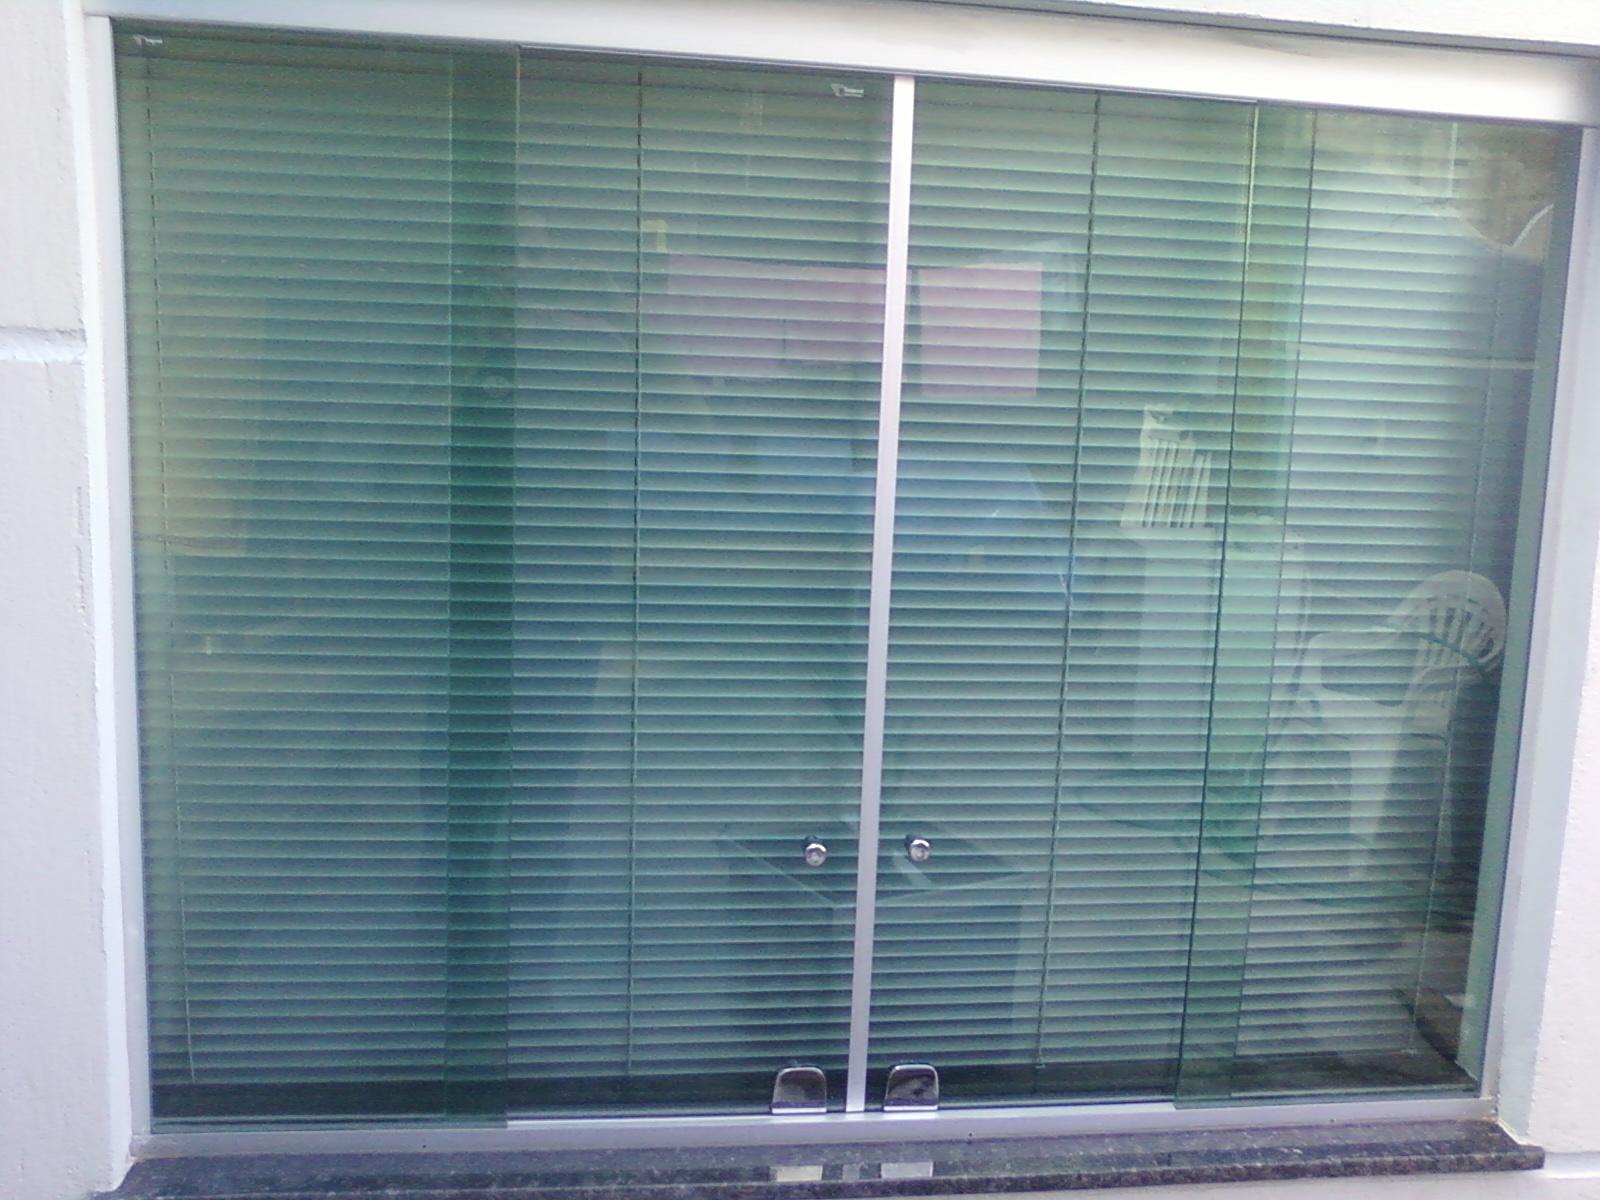 janela blindex kit aluminio natural fosco vidro verde com ferragens  #3C4D61 1600 1200